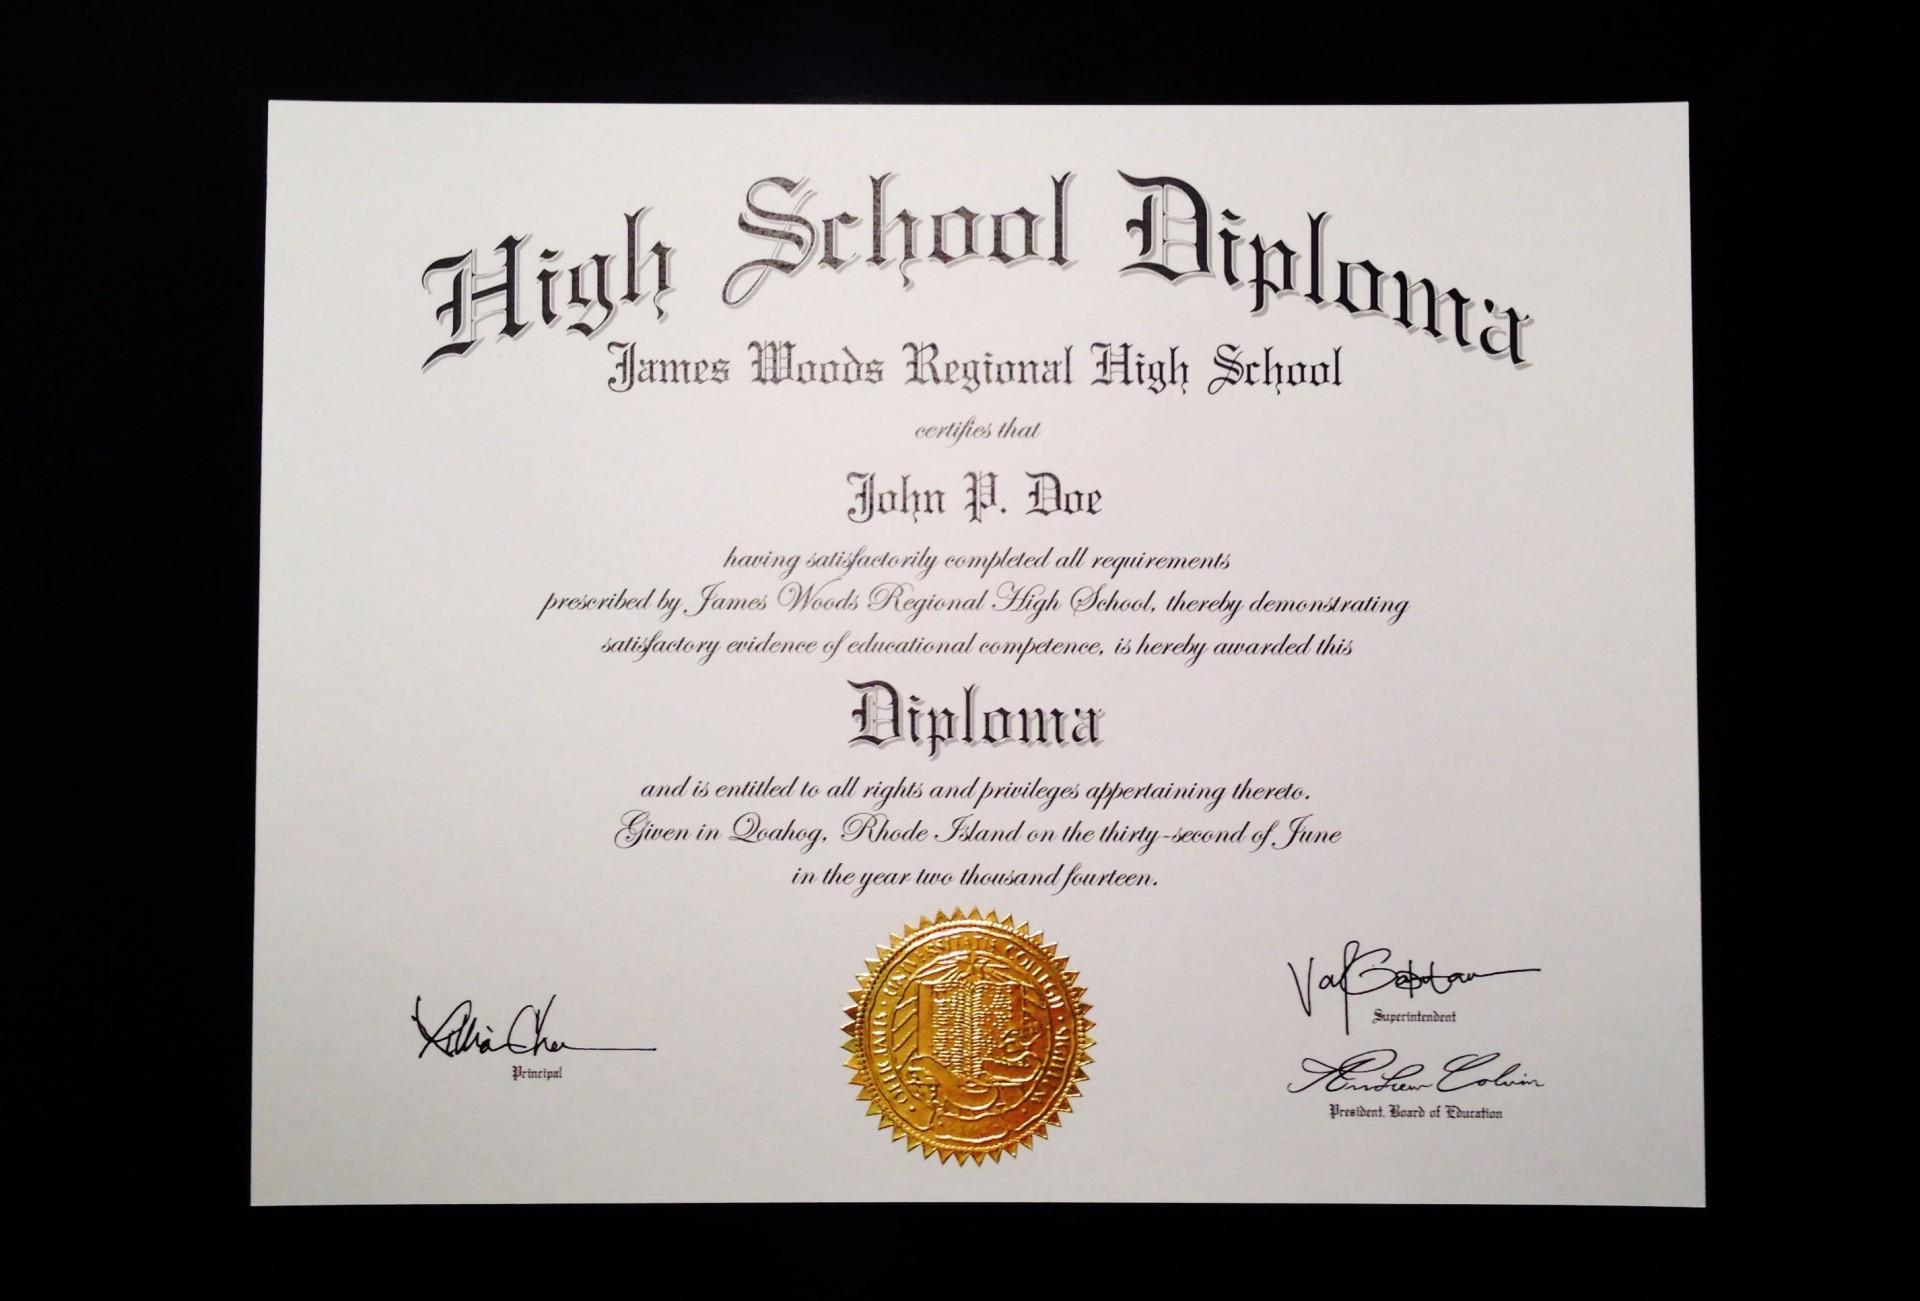 002 Incredible Free High School Diploma Template Resolution  Templates Print Out Editable Printable1920